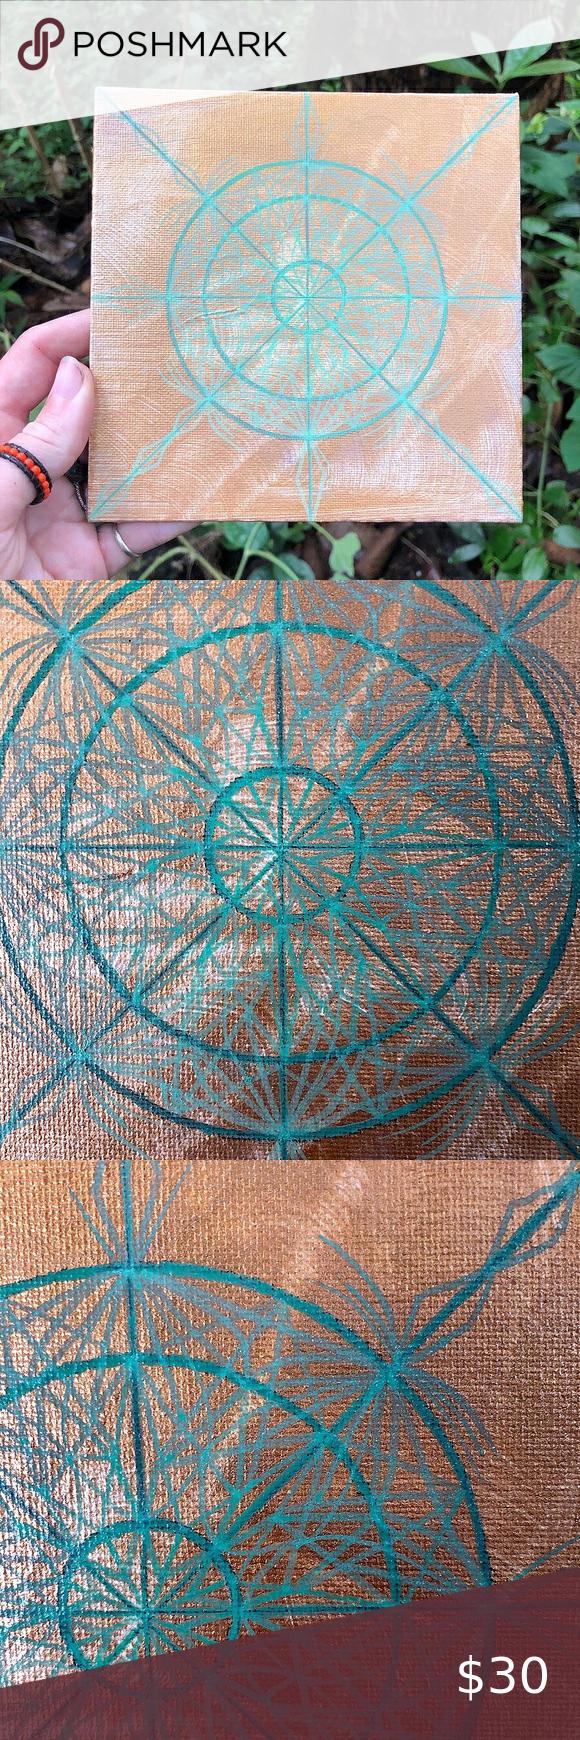 "Handmade Mini Mandala Painting ""Mellow"" 6x6"" #trippy #bigisland #painting #acrylic #acrylicpainting #presentmoment #art #meditation #colorful #crystalgrid #trippyart #vibrant #extrapolation #perception #energy #forsale #visualization #childlike #gratitude #sacred #journey #awareness #paintingwithlove #varnish #serenity #love #snowflake #mandala #freehand #sacredgeometry Wall Art Art & Decals"